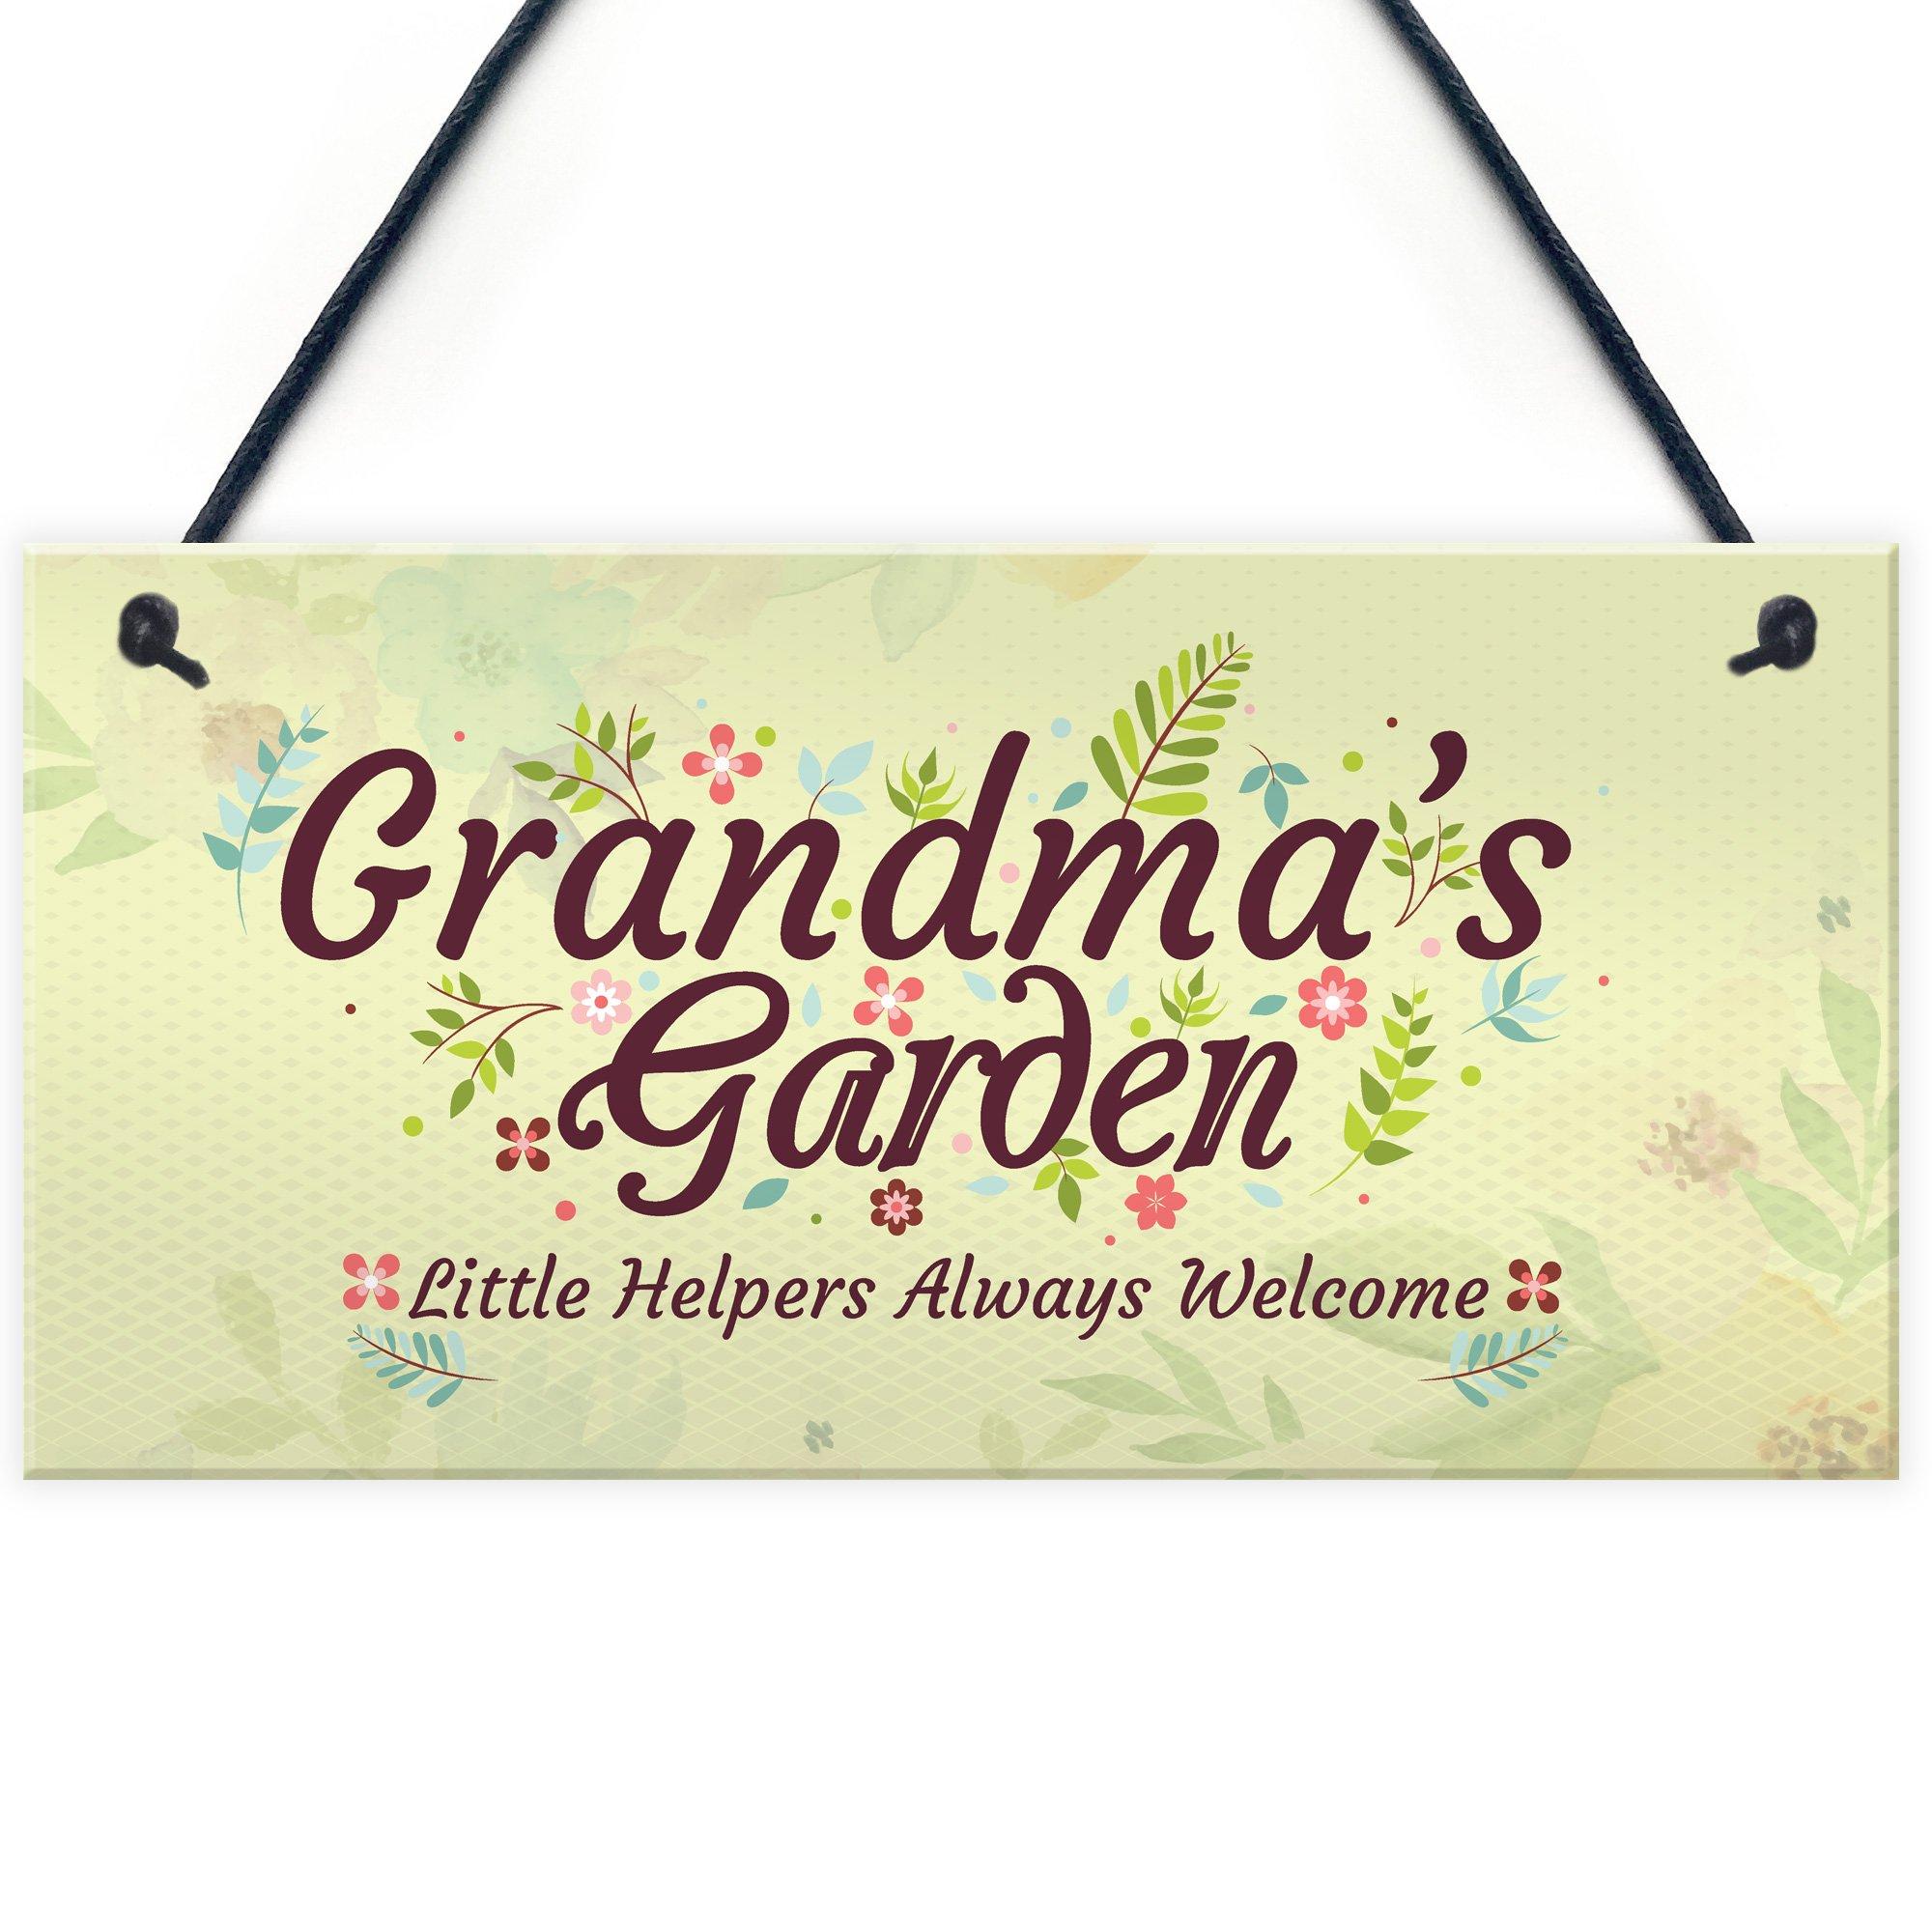 Grandma's Garden Novelty Hanging Plaque Summer House Sign Garden Shed Home Decor